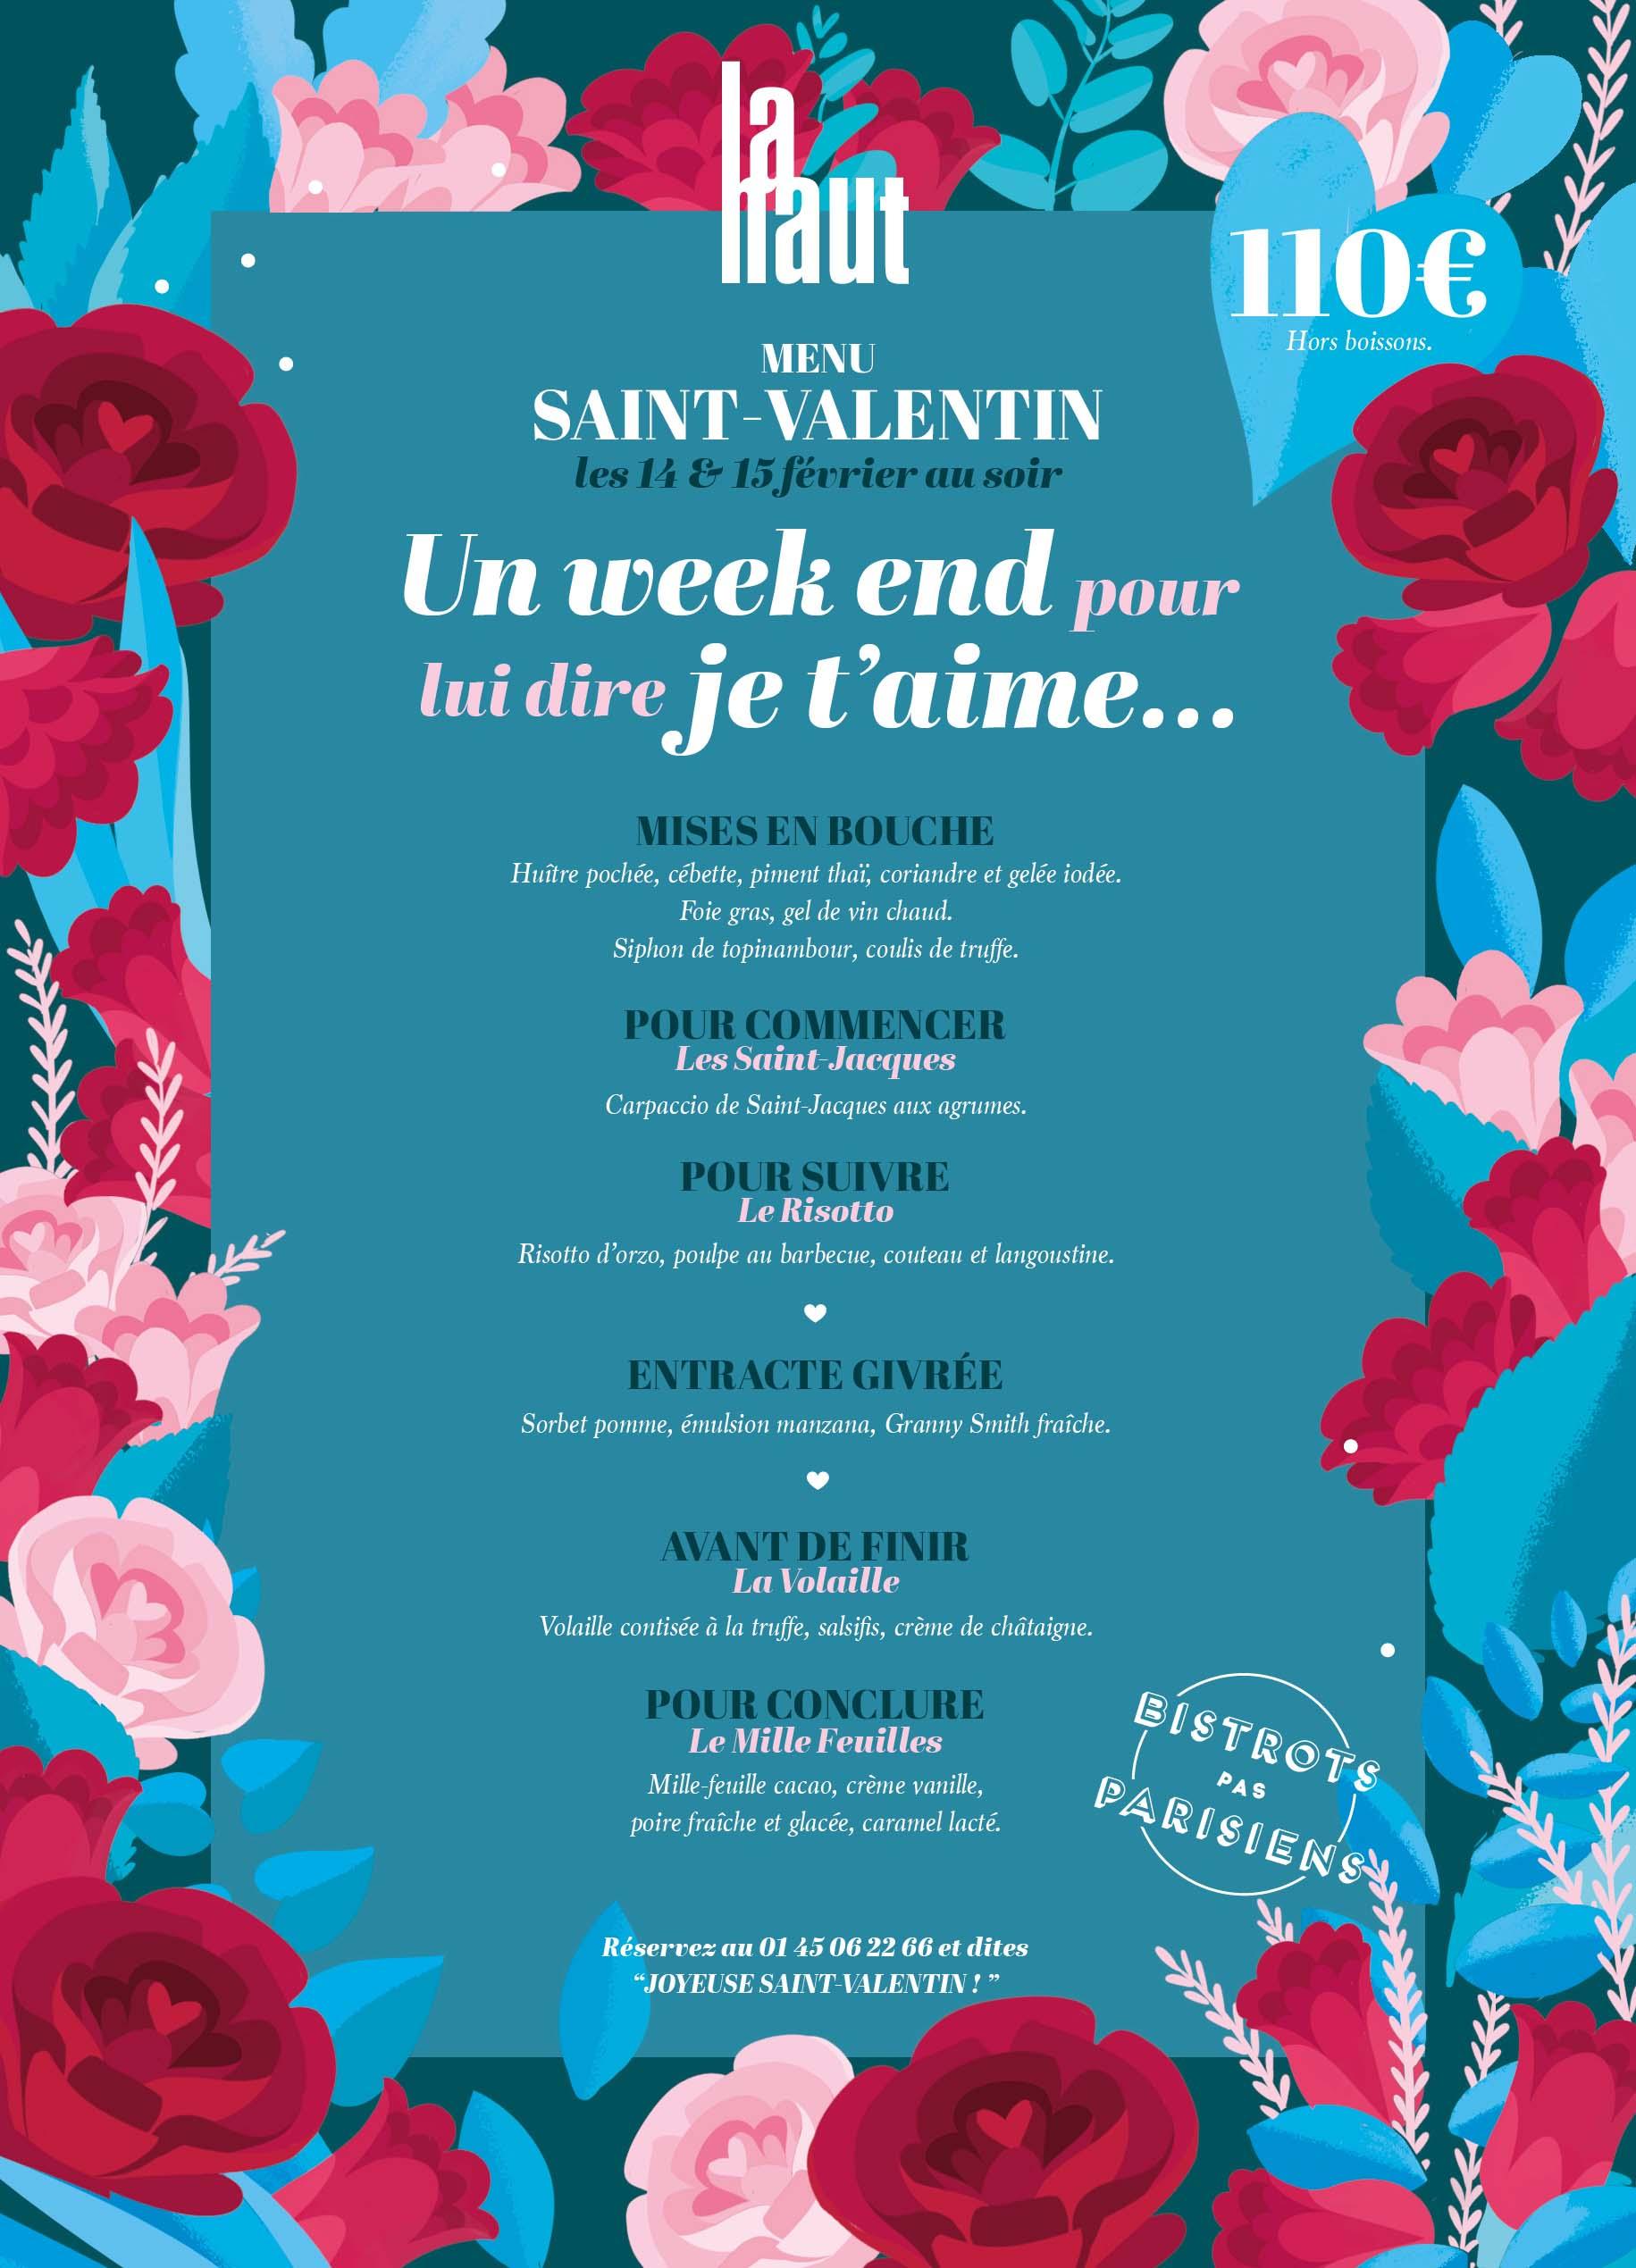 BPP-saintValentin-menu-digital-LaHaut